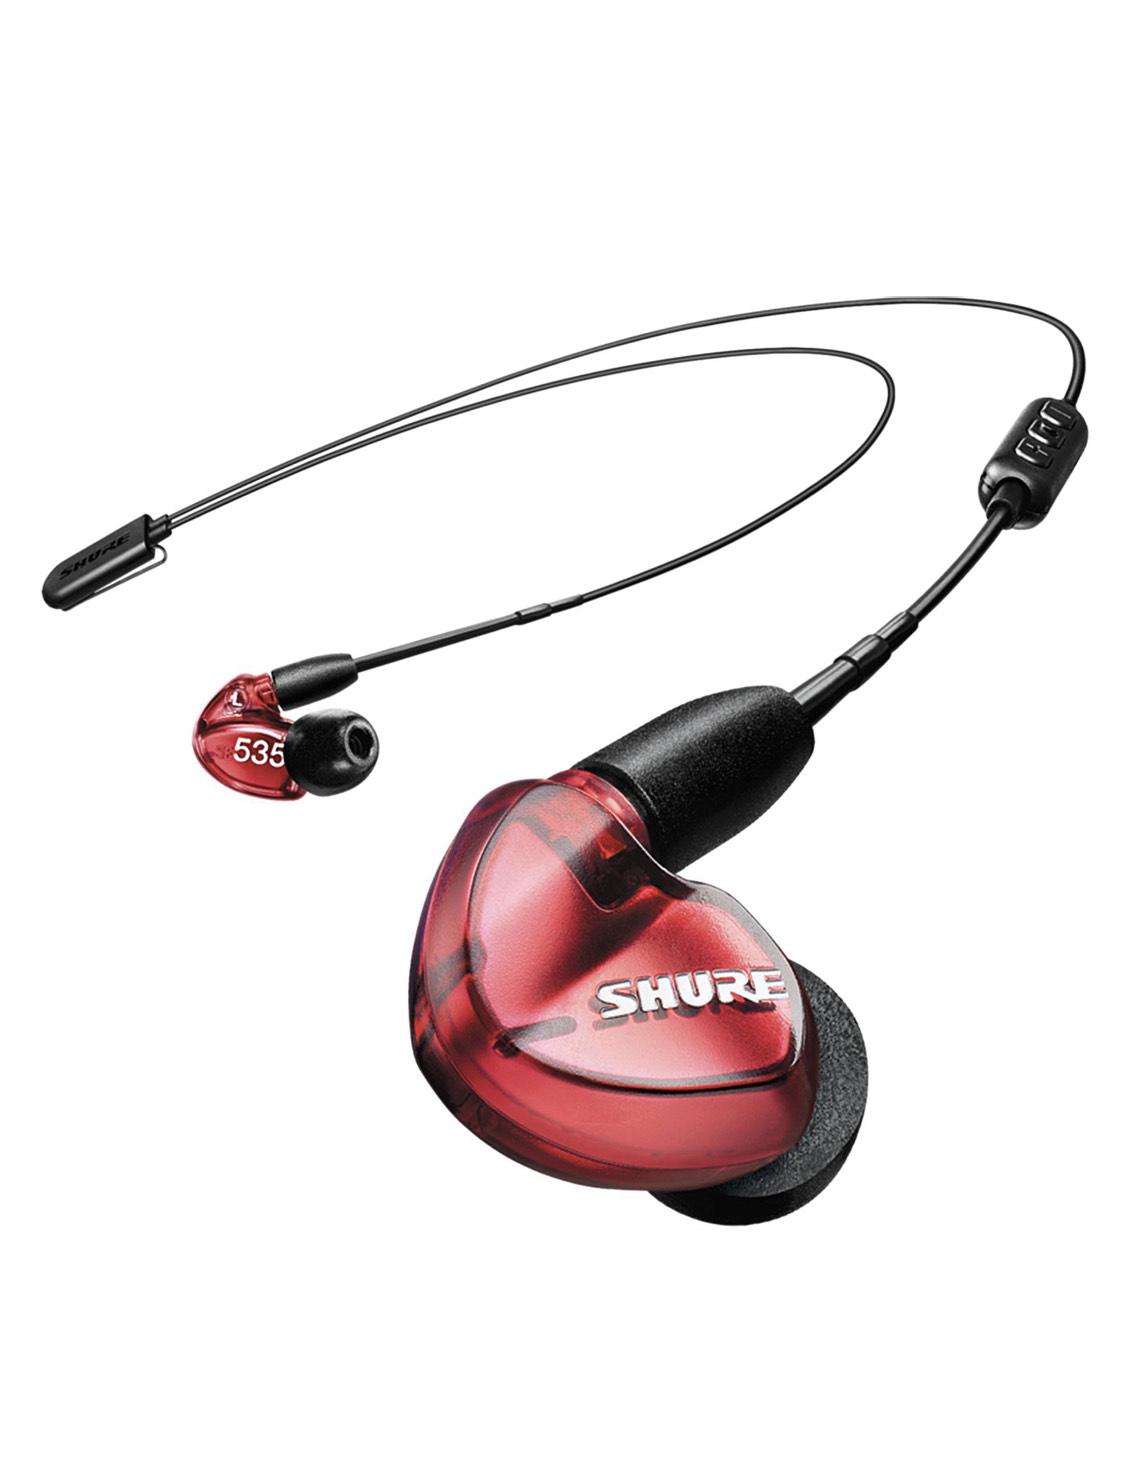 Shure SE535LTD+BT2-EFS - Sound Isolating Inear Kopfhörer | Bluetooth 5.0 & aptX